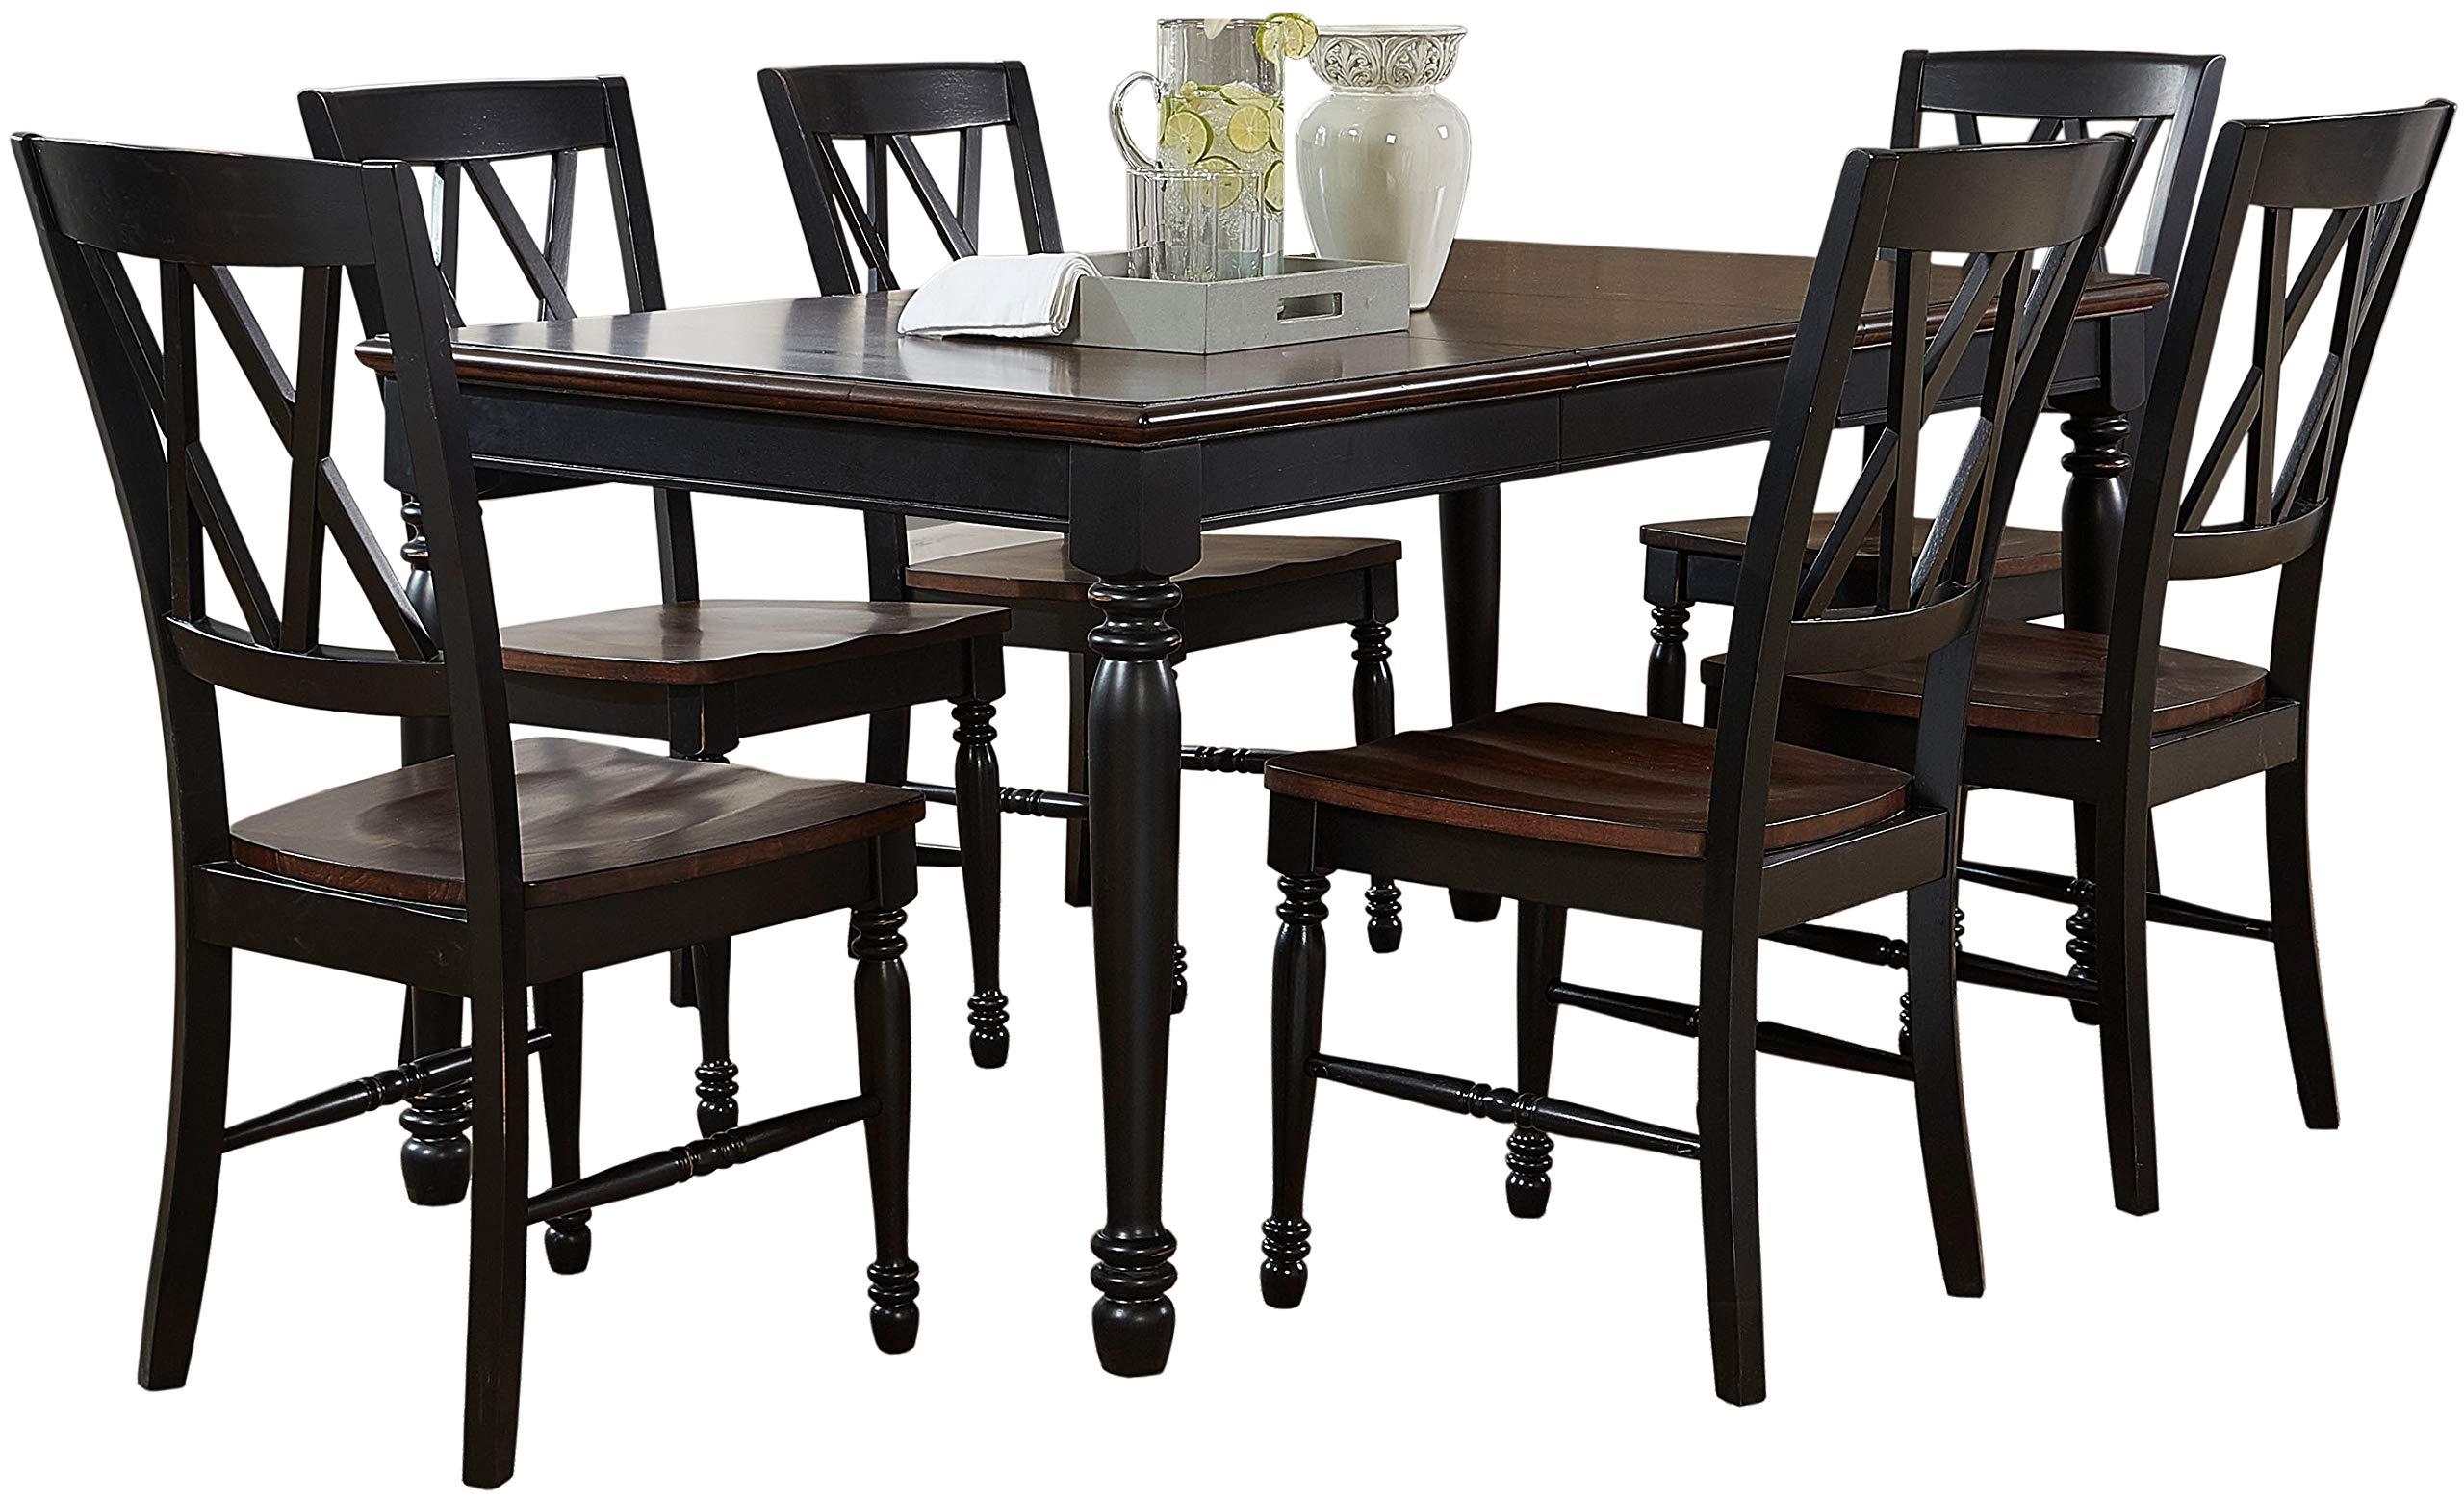 Crosley Furniture KF20001-BK Shelby 7-Piece Dining Set, Black by Crosley Furniture (Image #1)